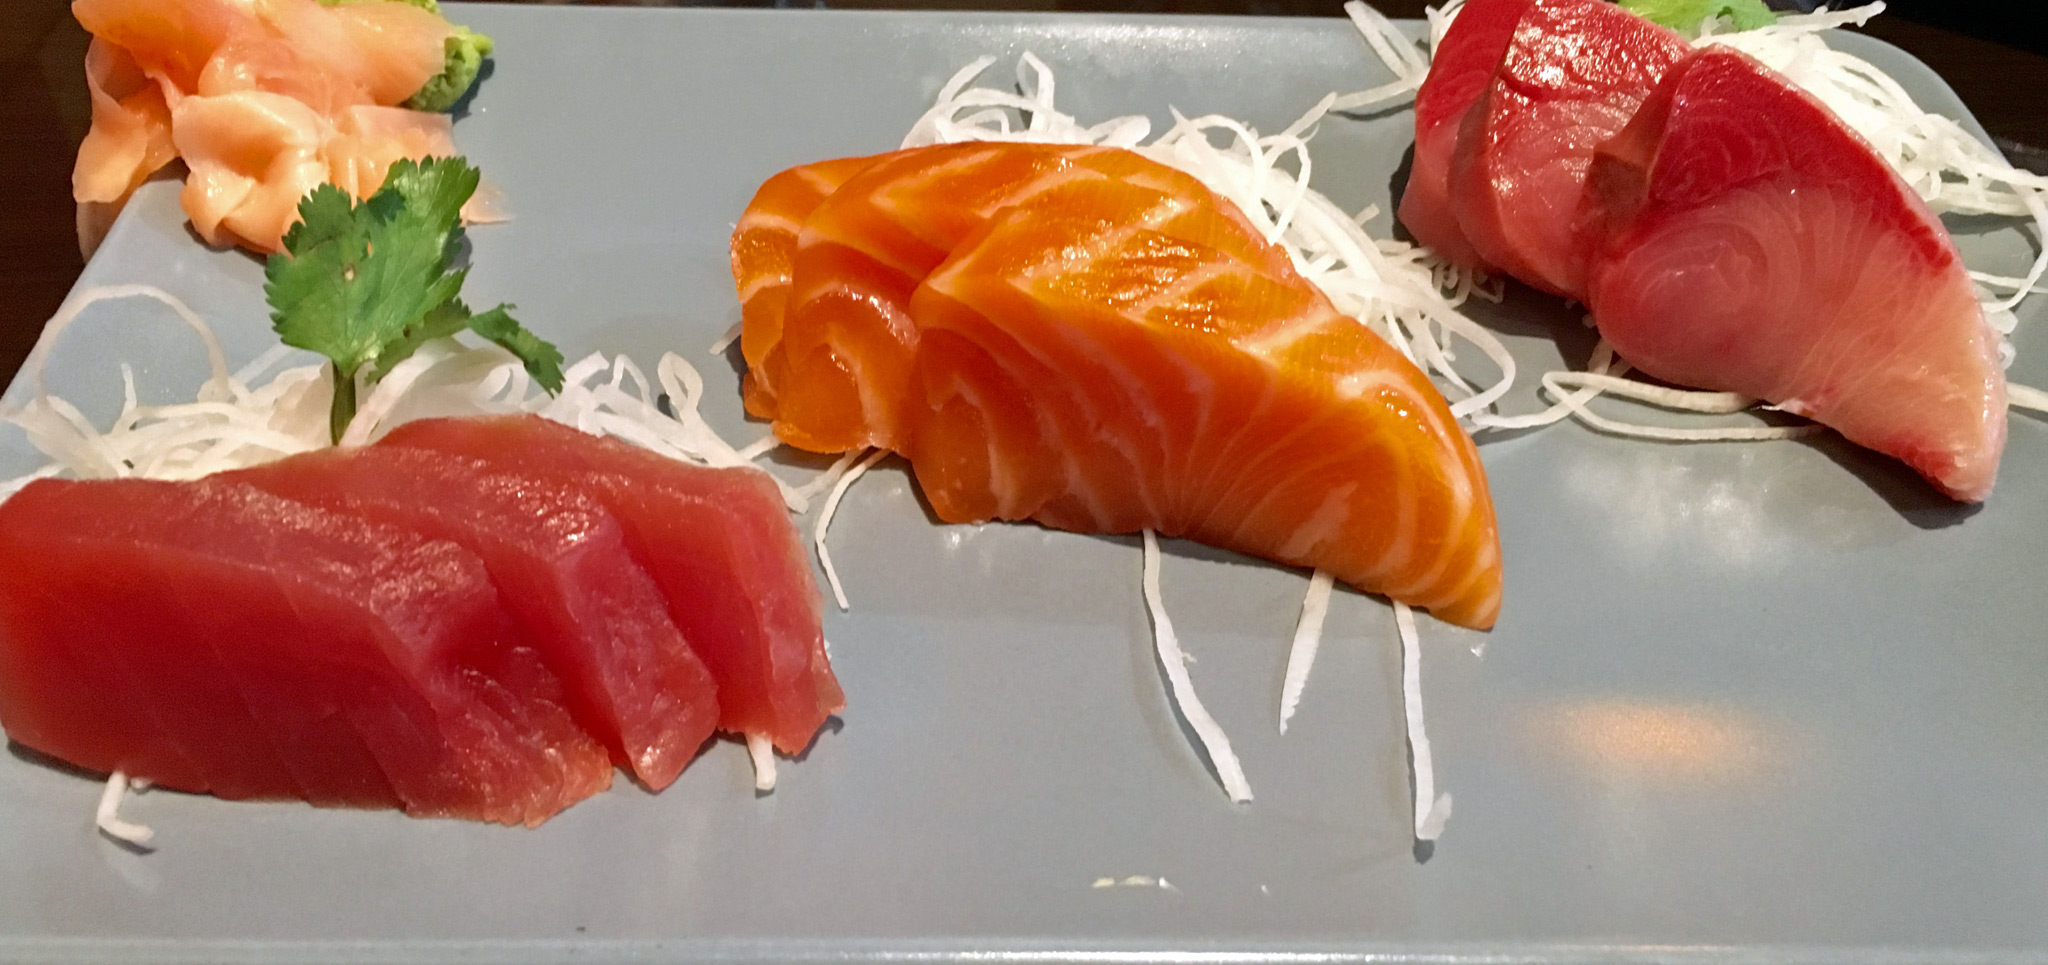 SASHIMI APPETIZER |- Sliced tuna, salmon and yellowtail